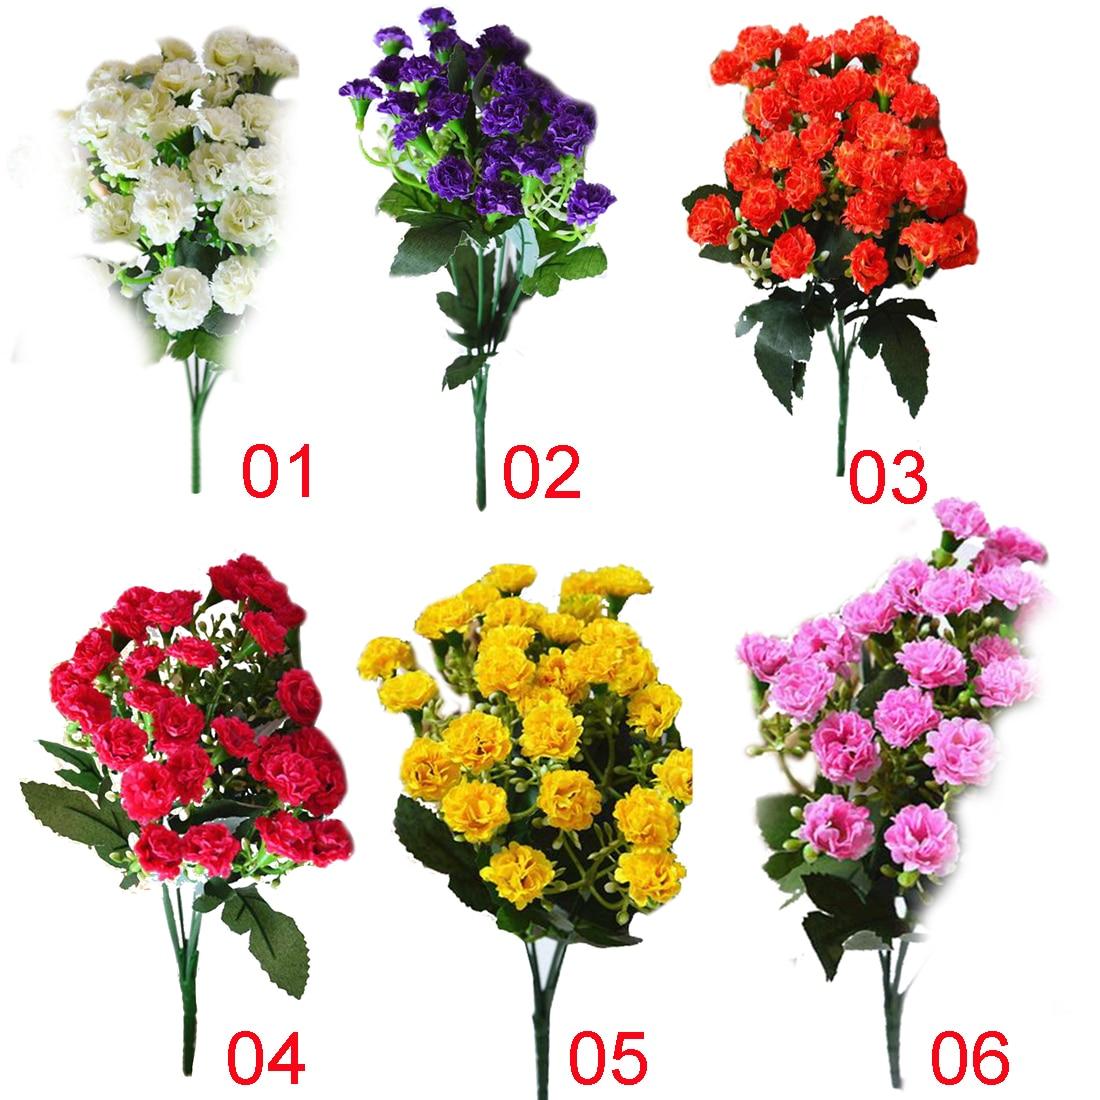 Sutra Buatan Baru Bunga Anyelir 30 Tunas Bunga 6 Cabang 1 Buket Ibu Ungu Bunga Kerajinan Untuk Pernikahan Rumah Pesta Flower Craft Artificial Silk Flowerssilk Flowers Aliexpress